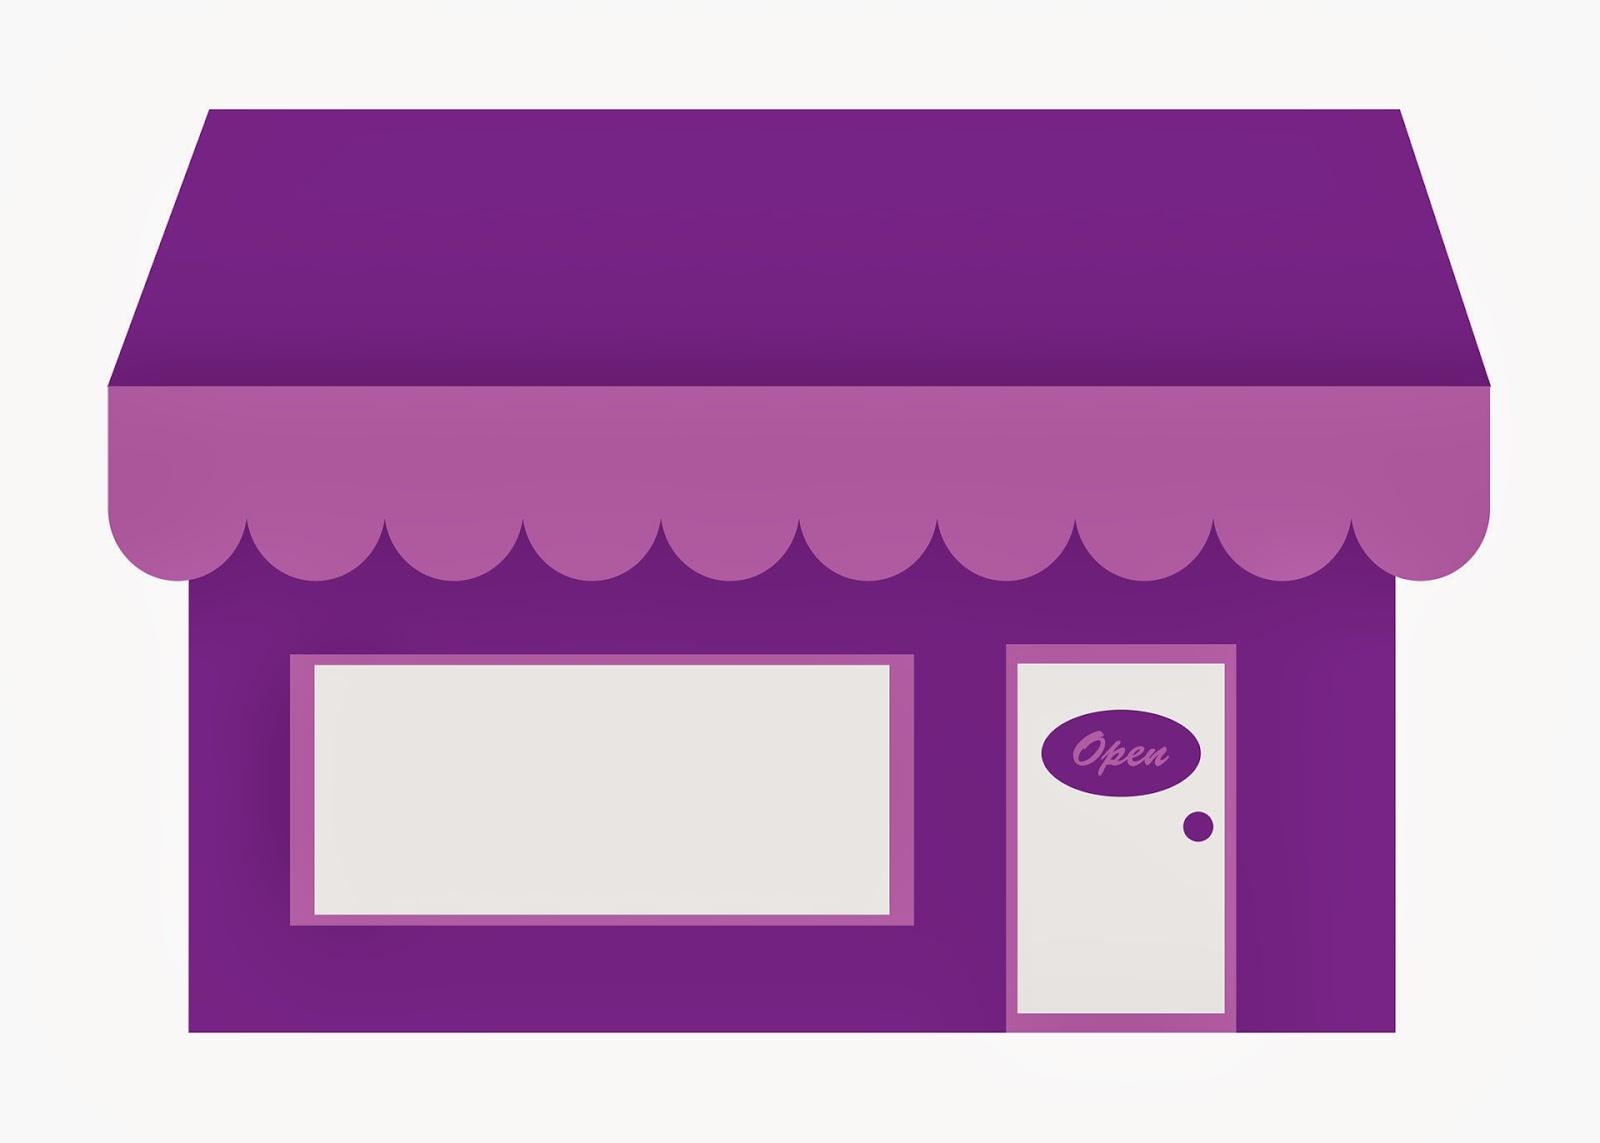 retail store clip art free - photo #6